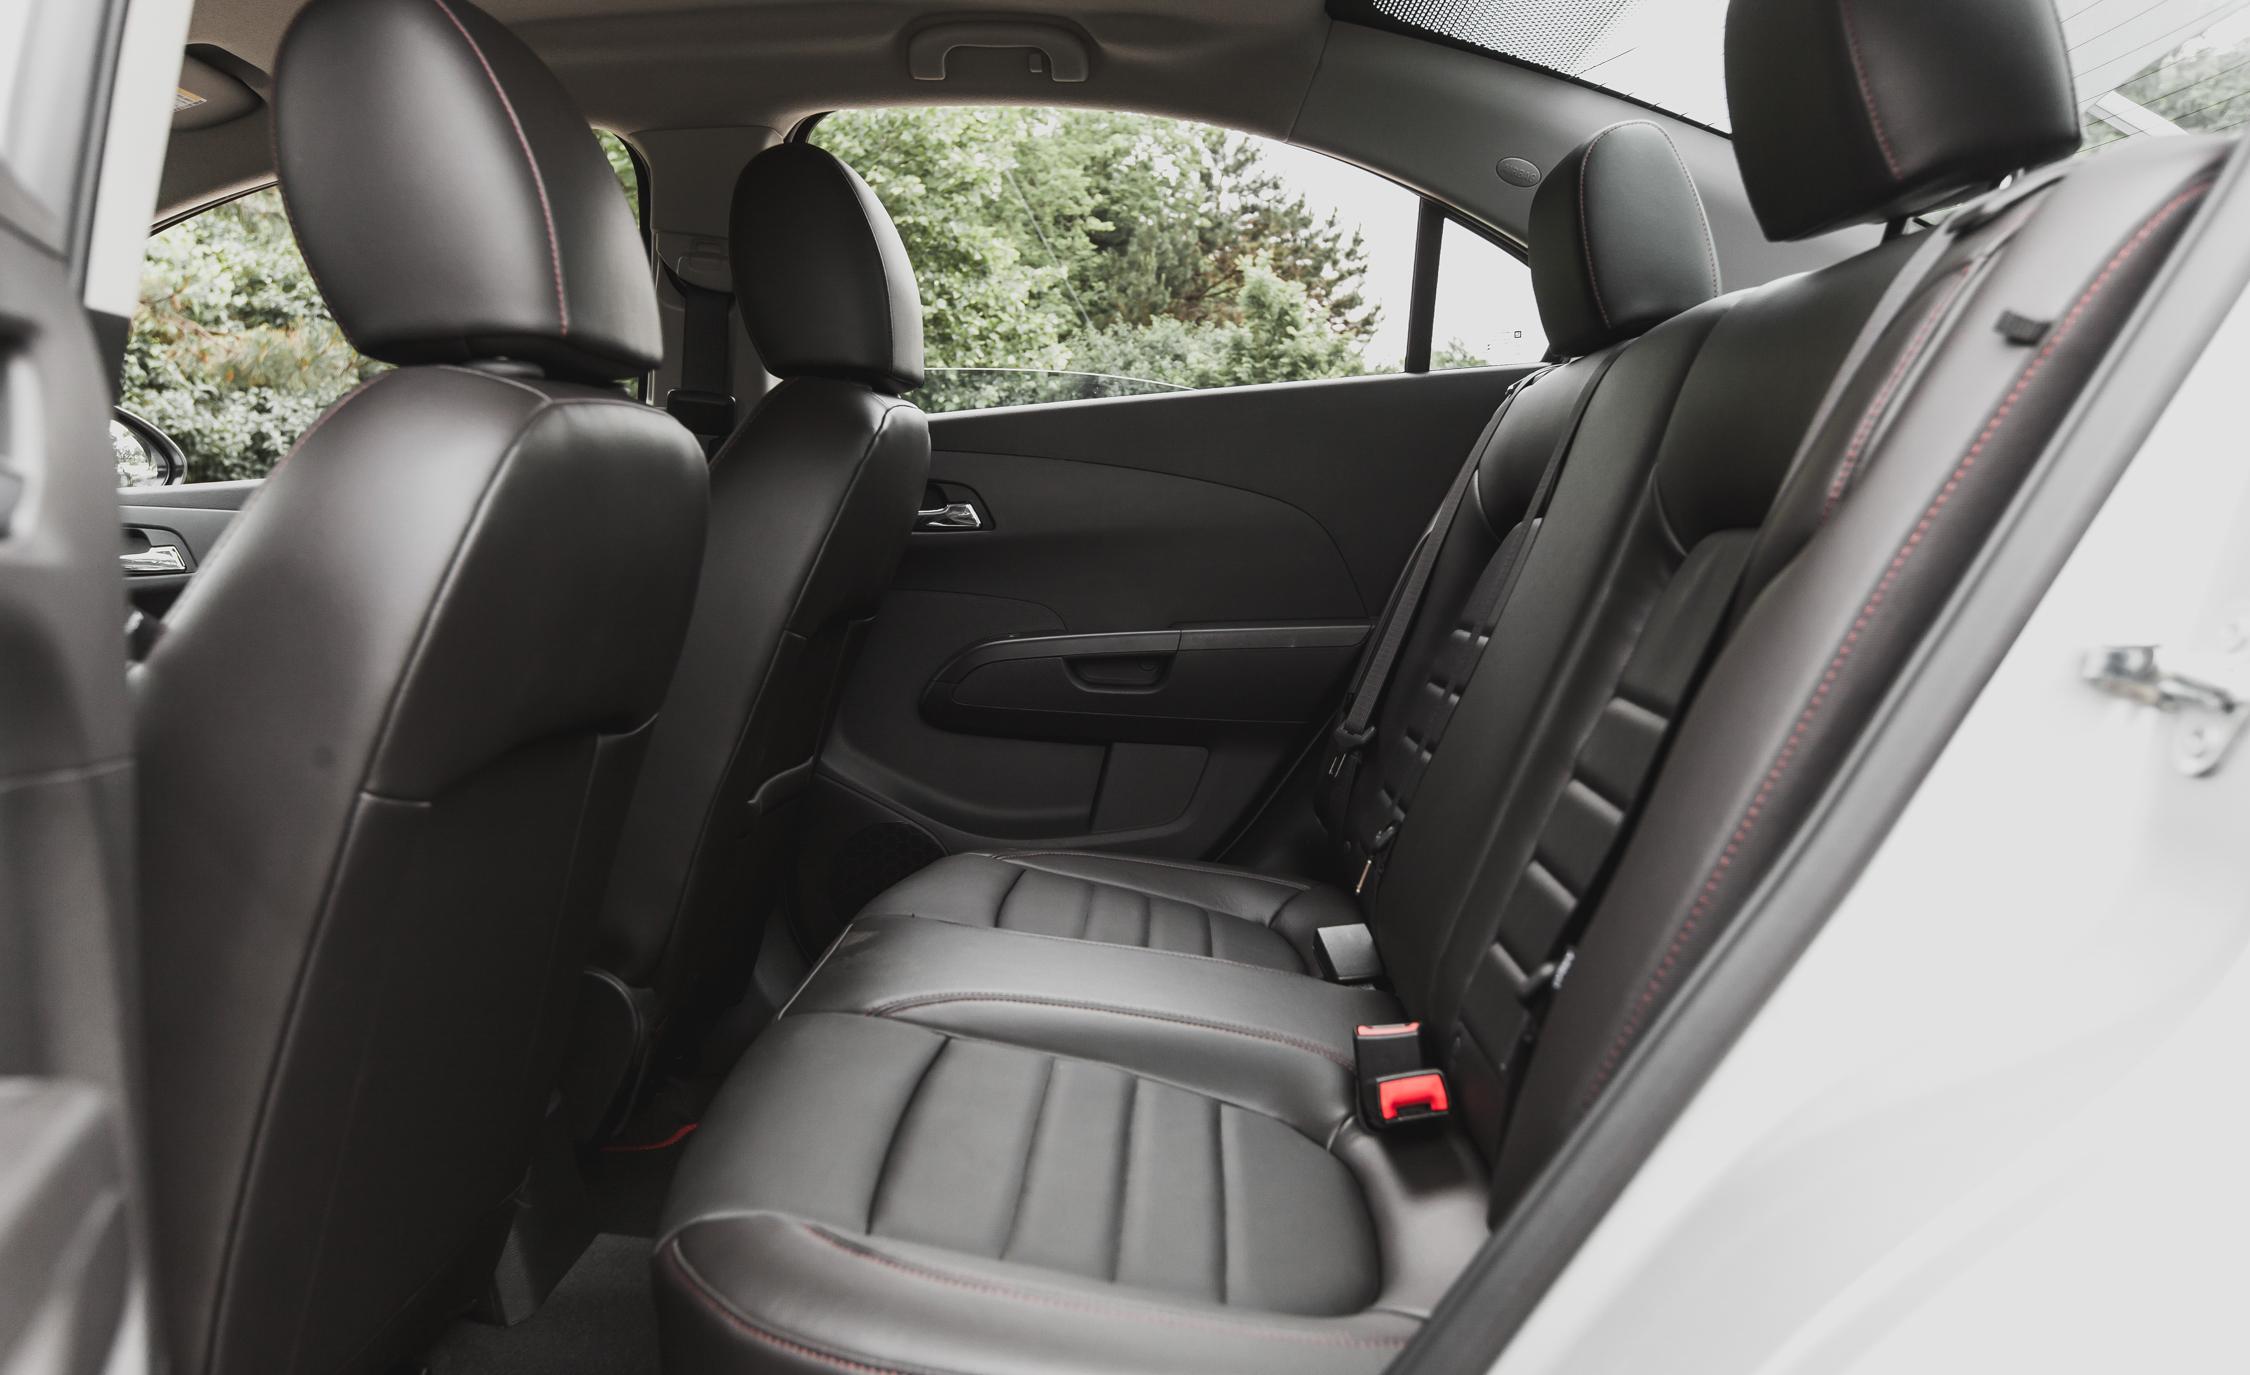 2014 Chevrolet Sonic RS Sedan Interior (View 16 of 27)